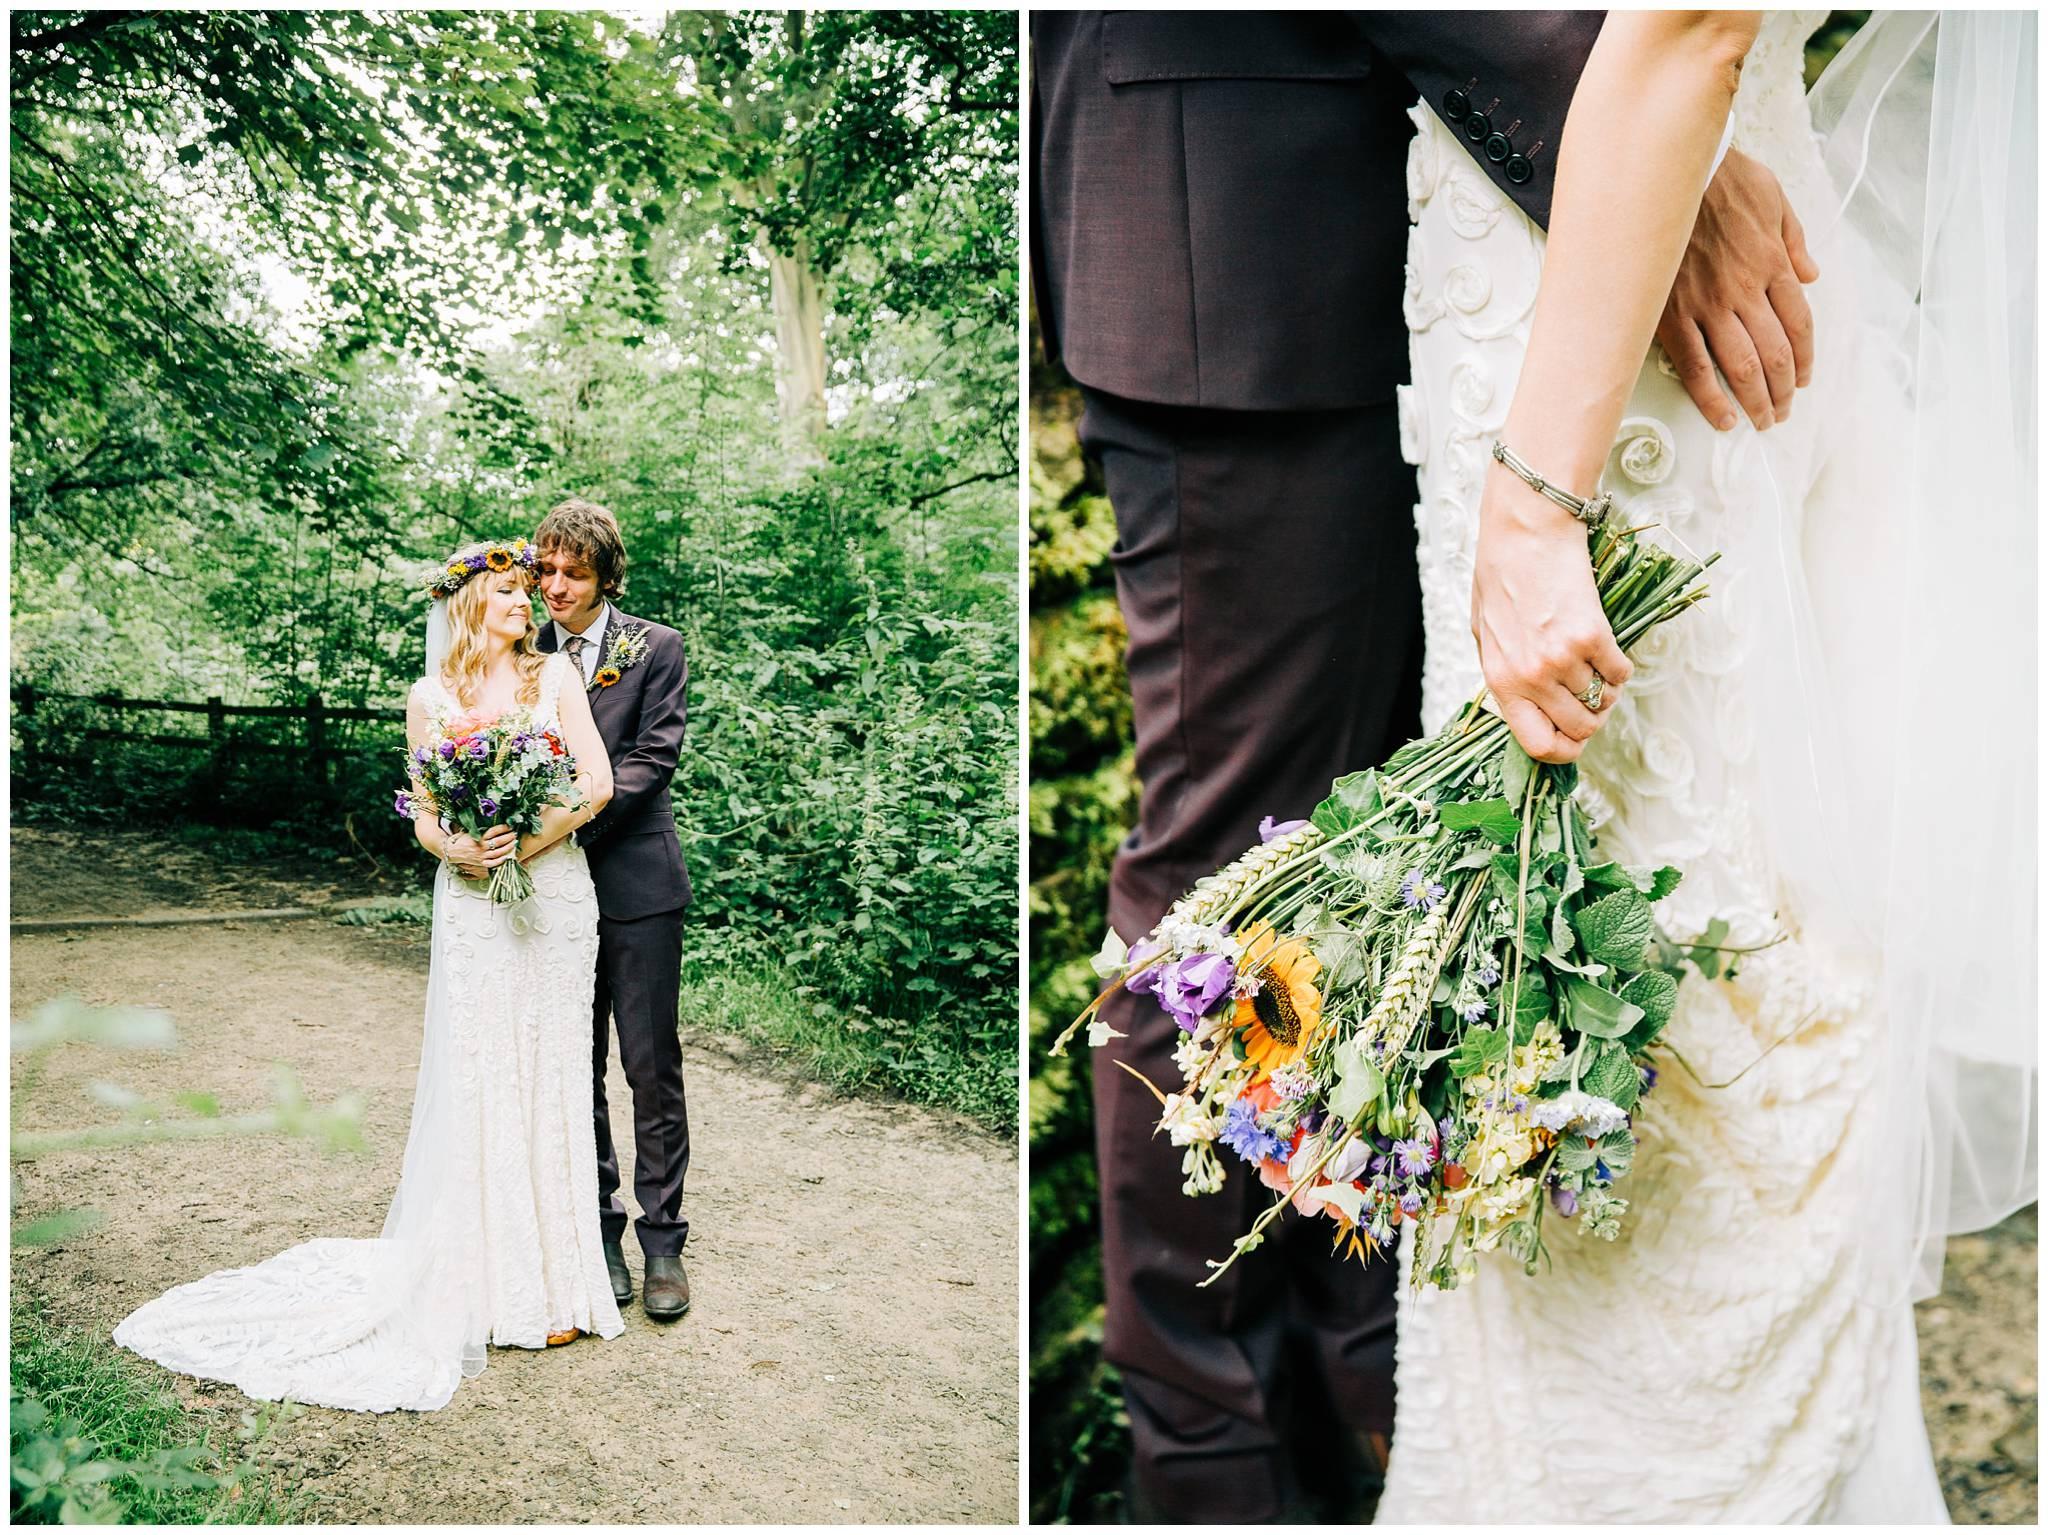 bride and groom cuddling in woodland setting